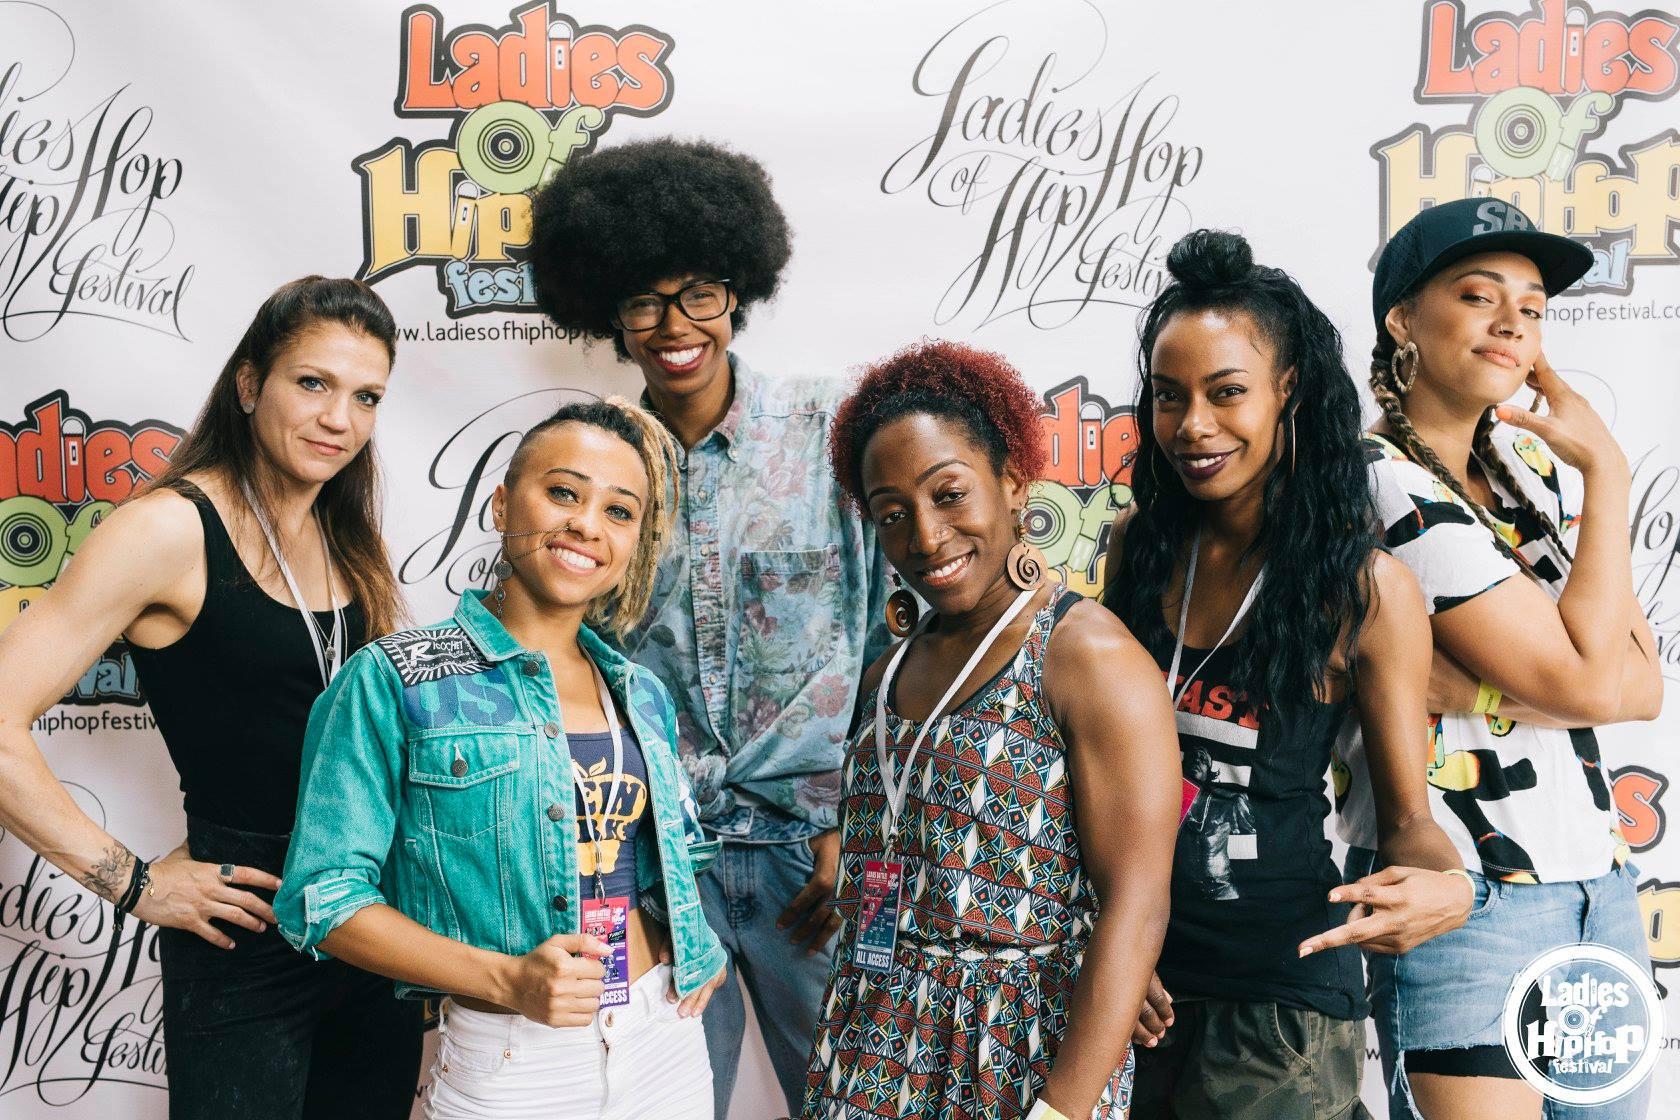 Ladies of Hip Hop Festival 2017 Judges - New York City, USA